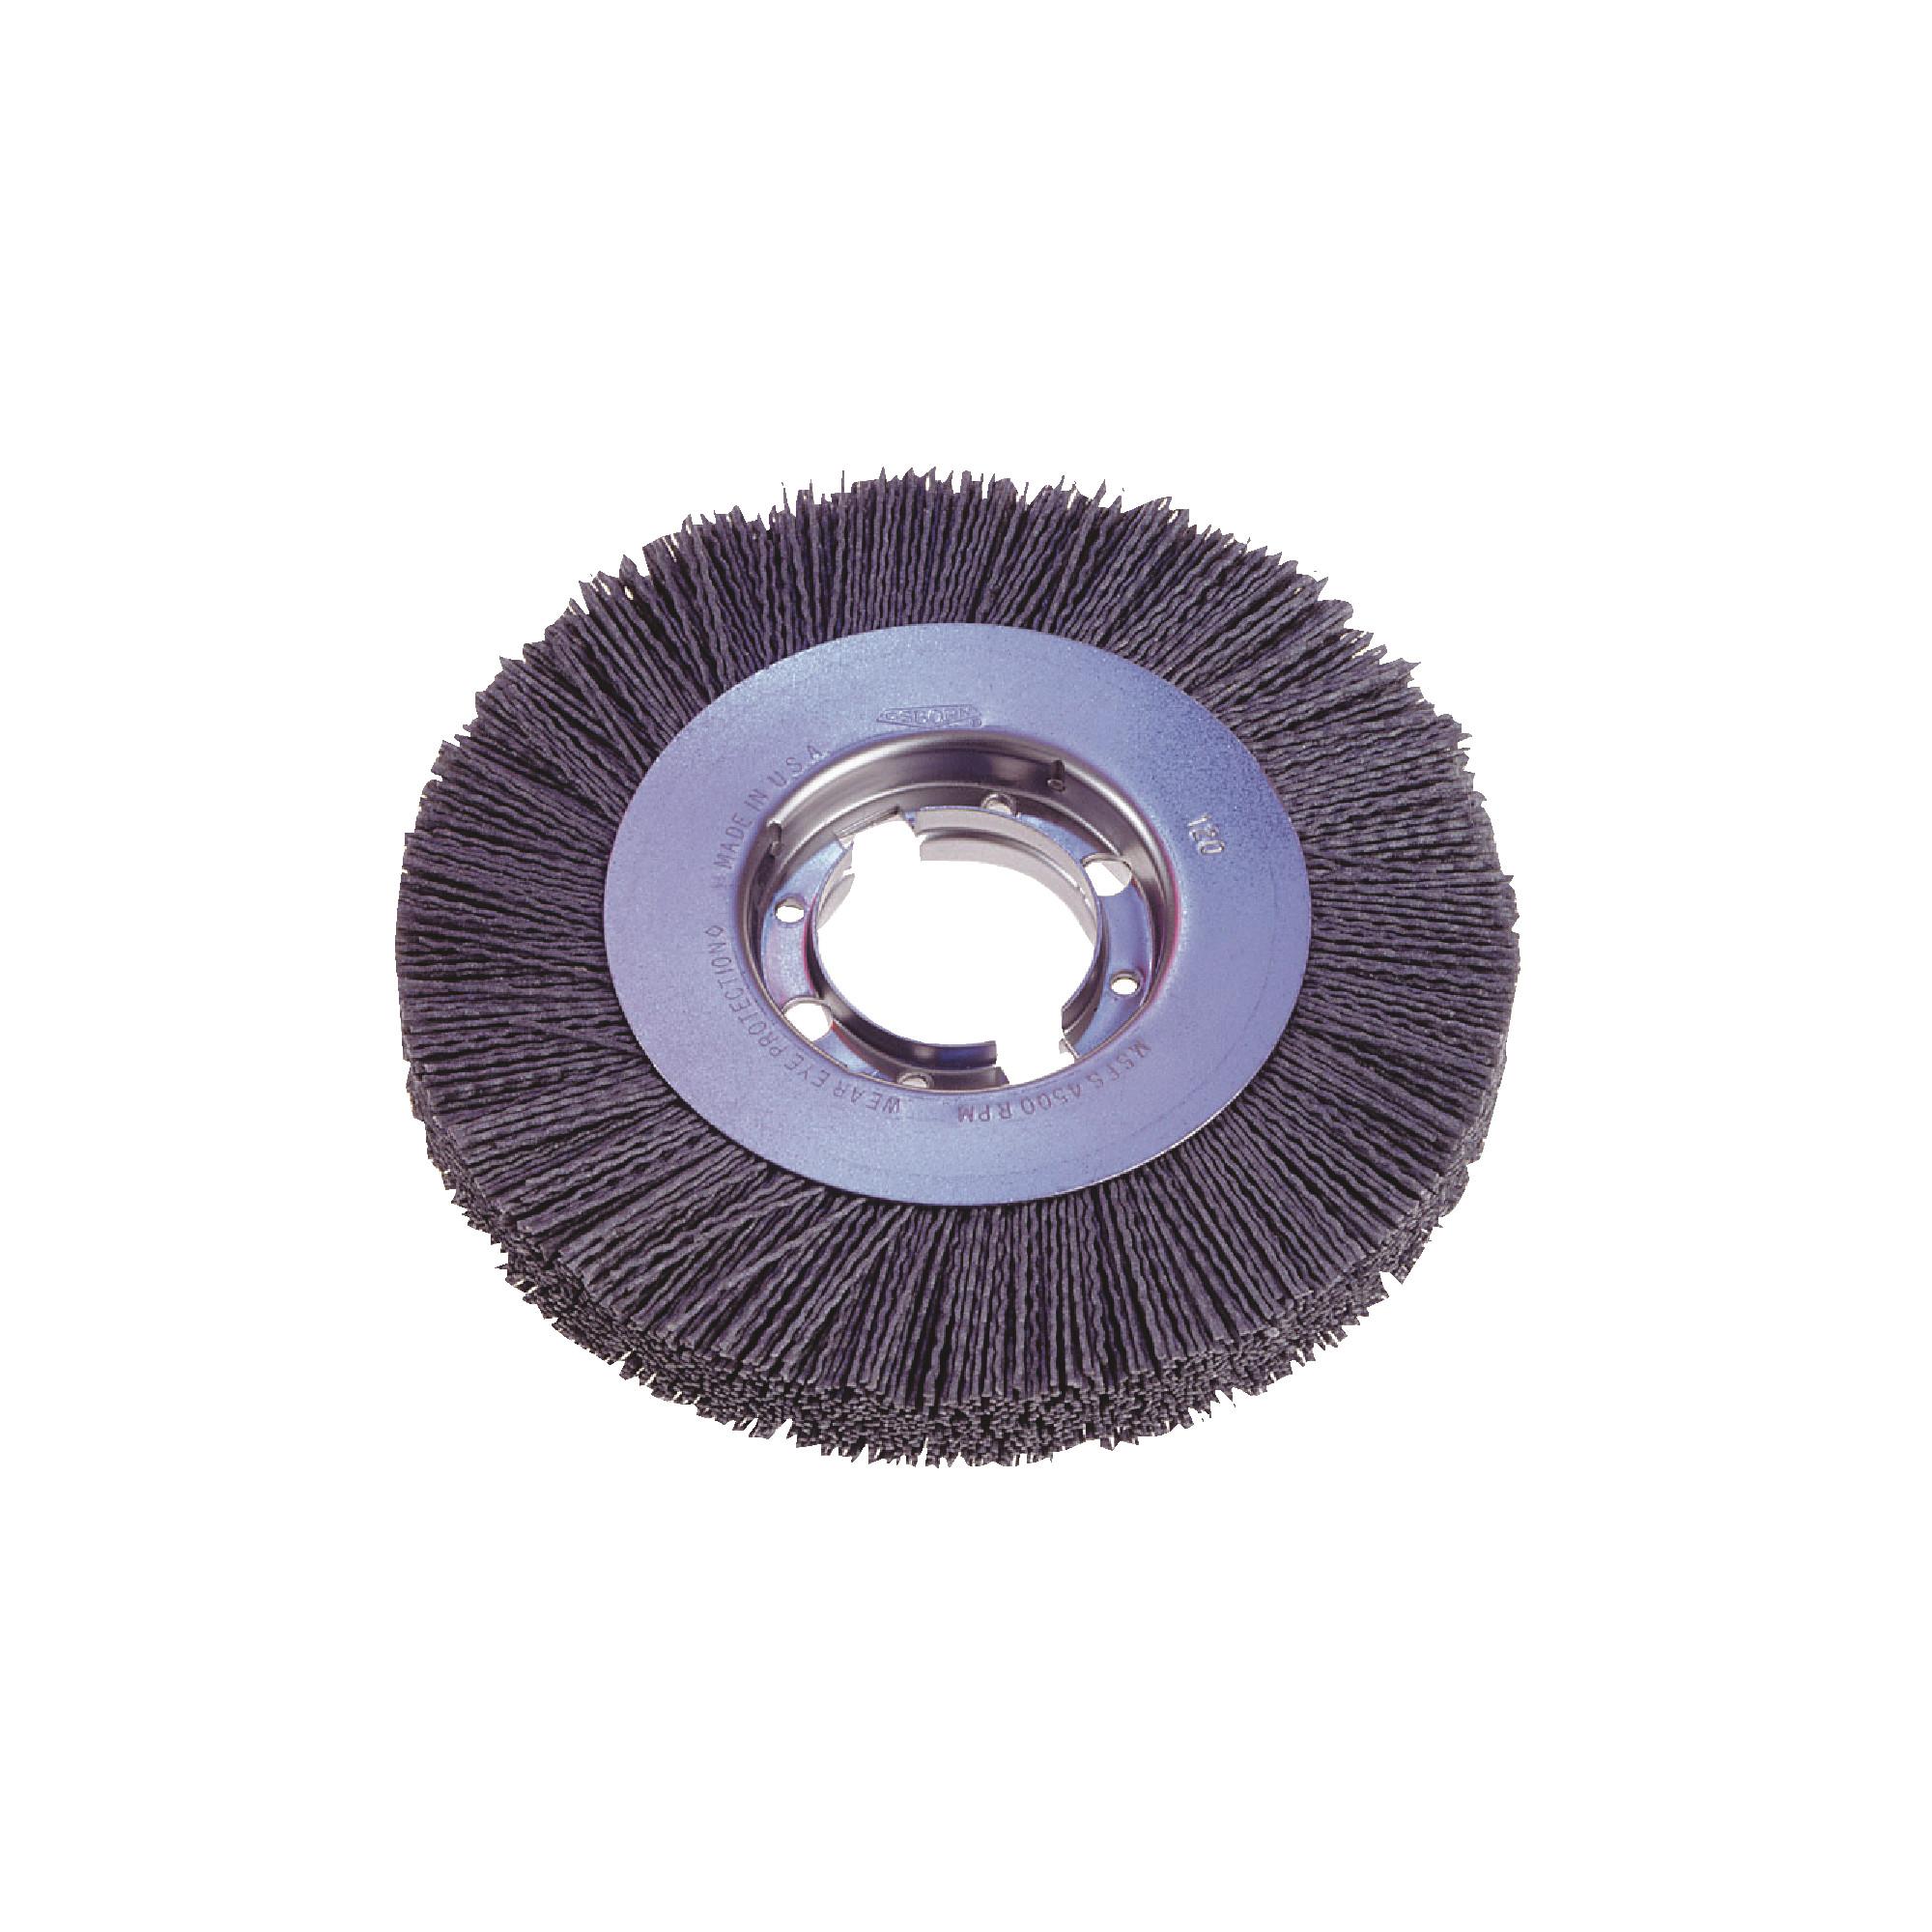 ATB Wide Face Brush Wheel